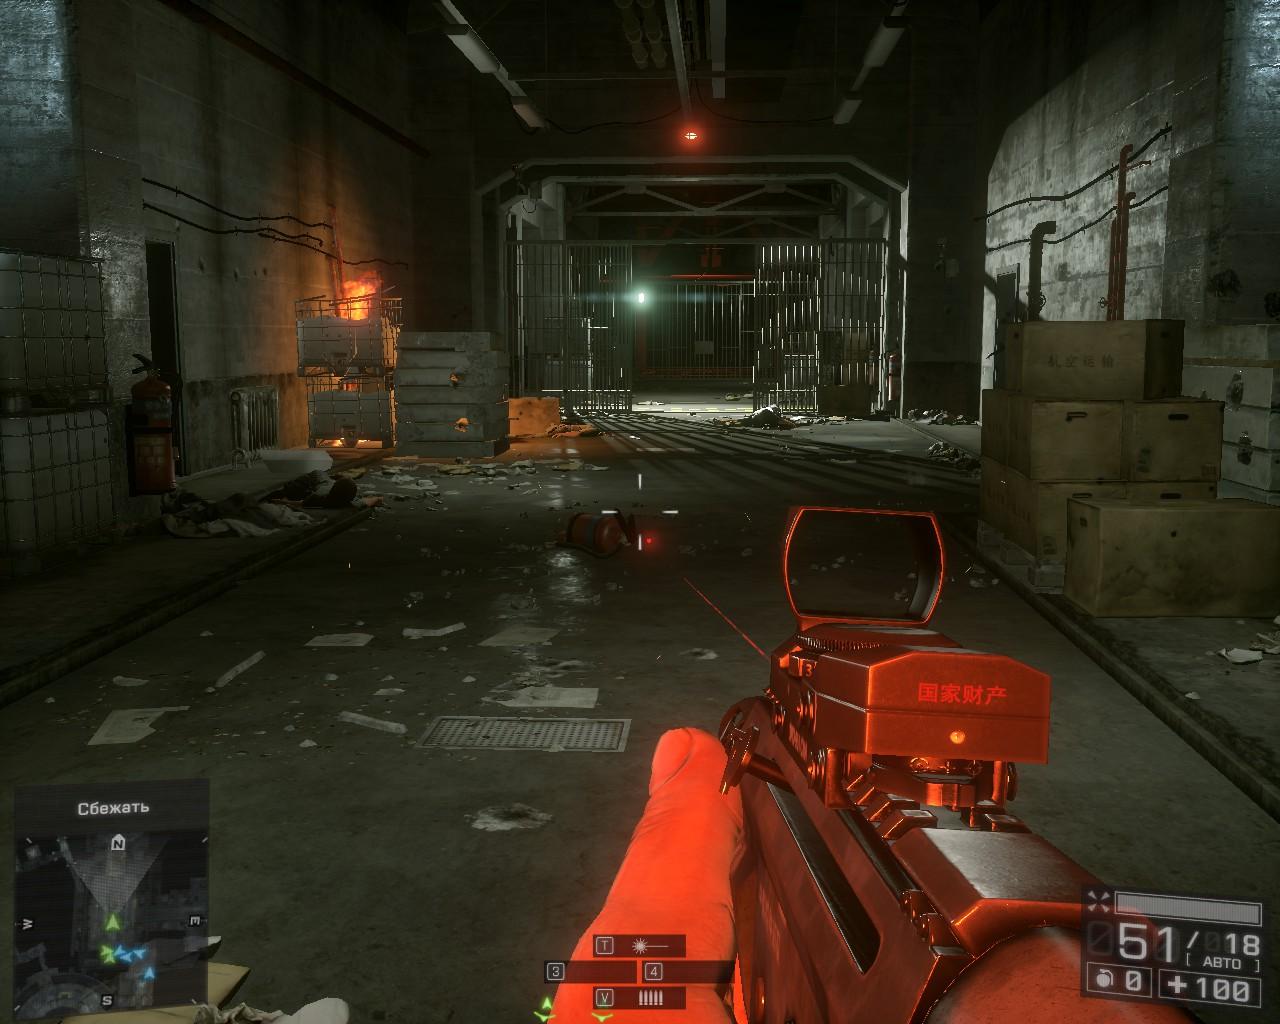 bf4 2014-04-06 00-34-28-97.jpg - Battlefield 4